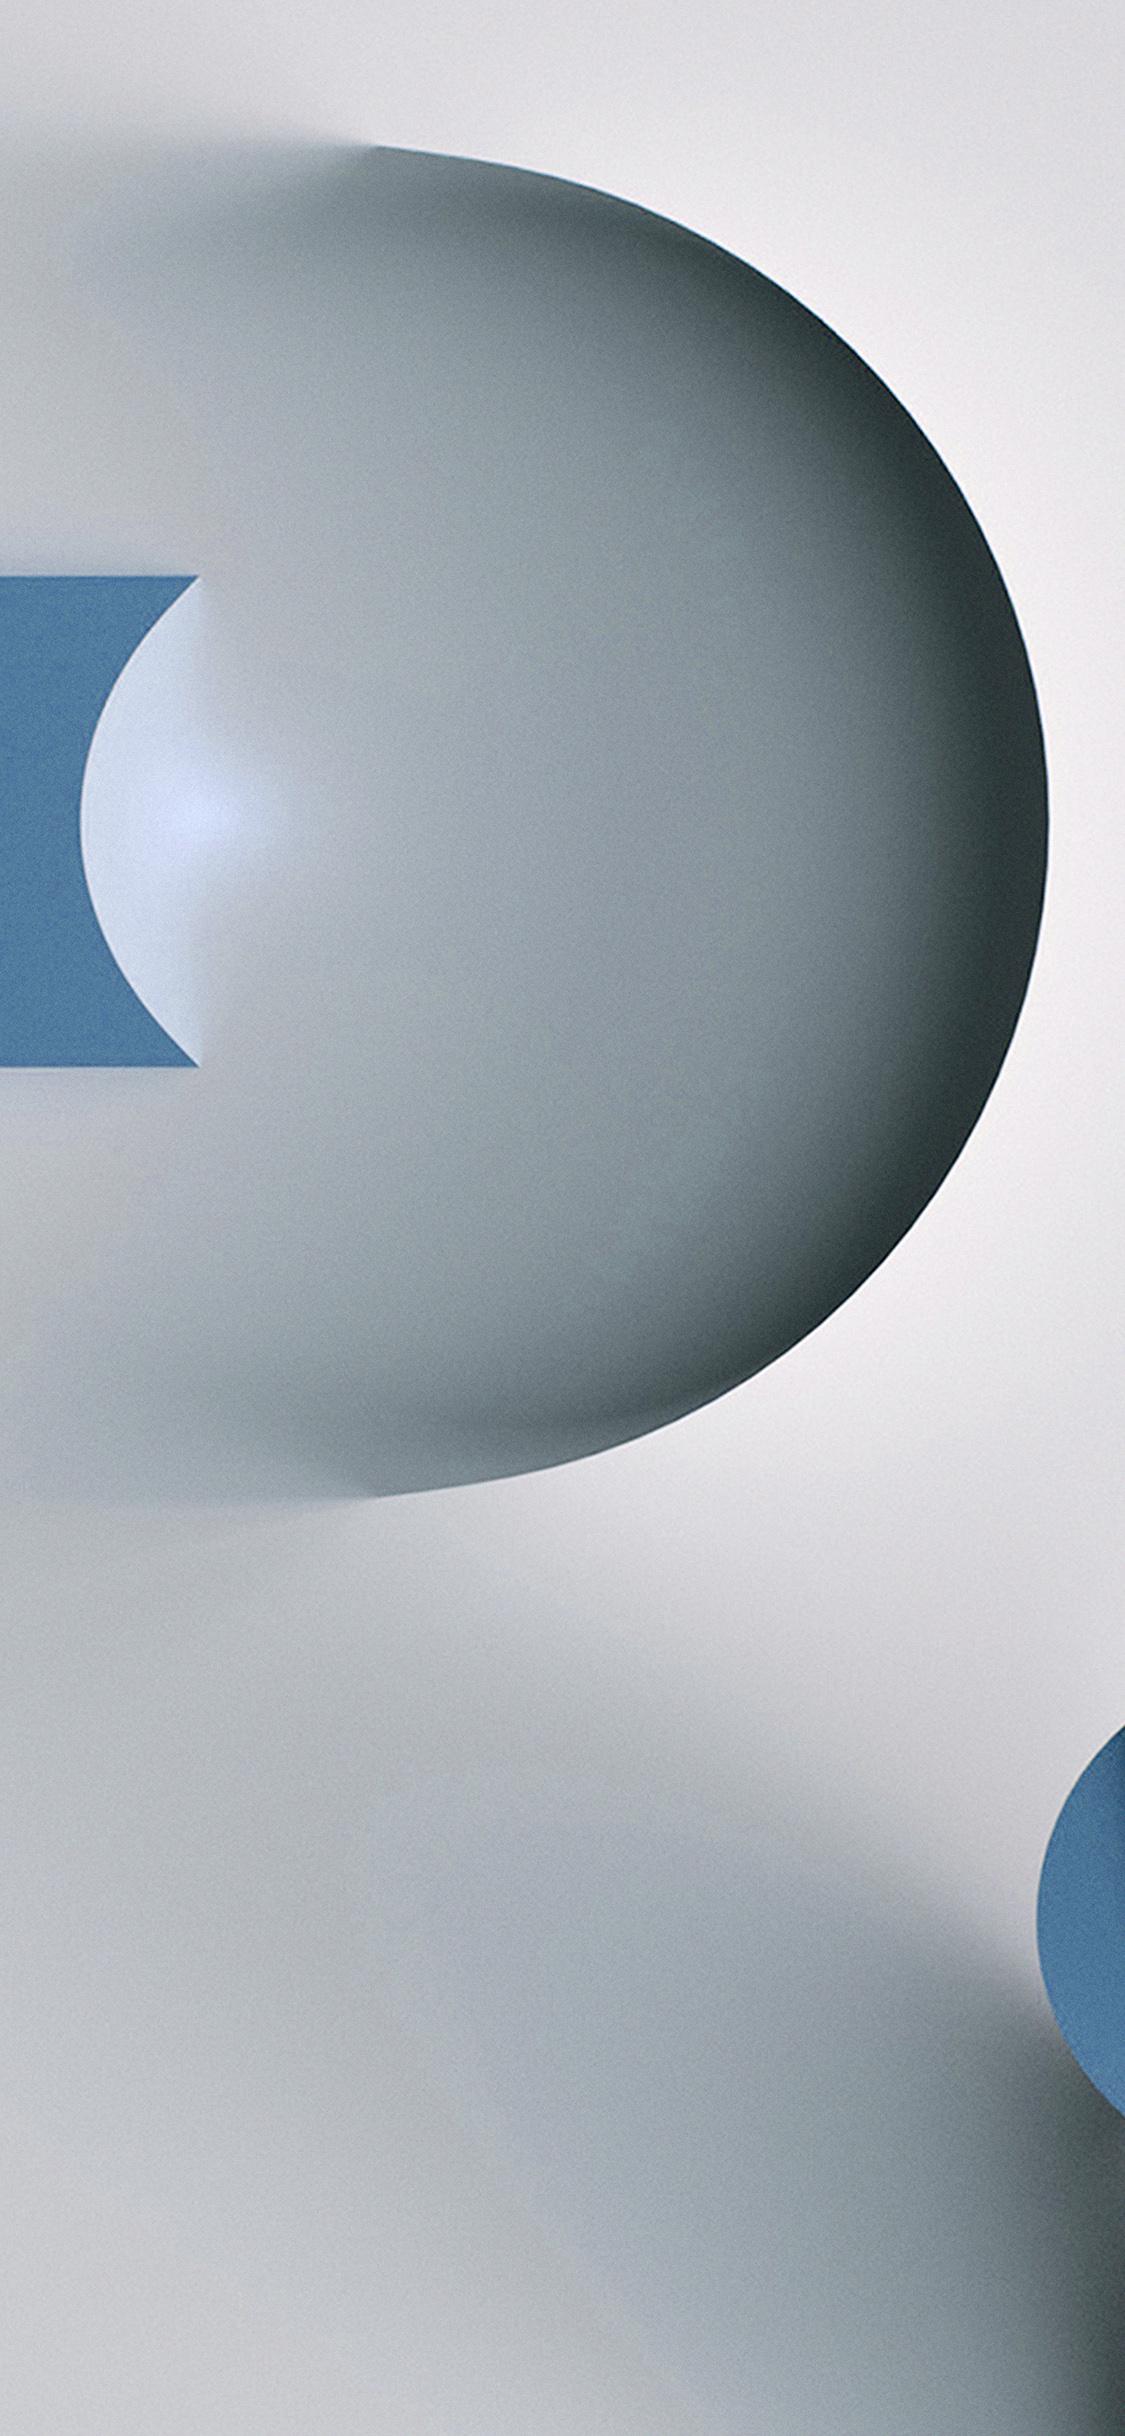 iPhonexpapers.com-Apple-iPhone-wallpaper-ba66-circle-line-simple-illustration-art-blue